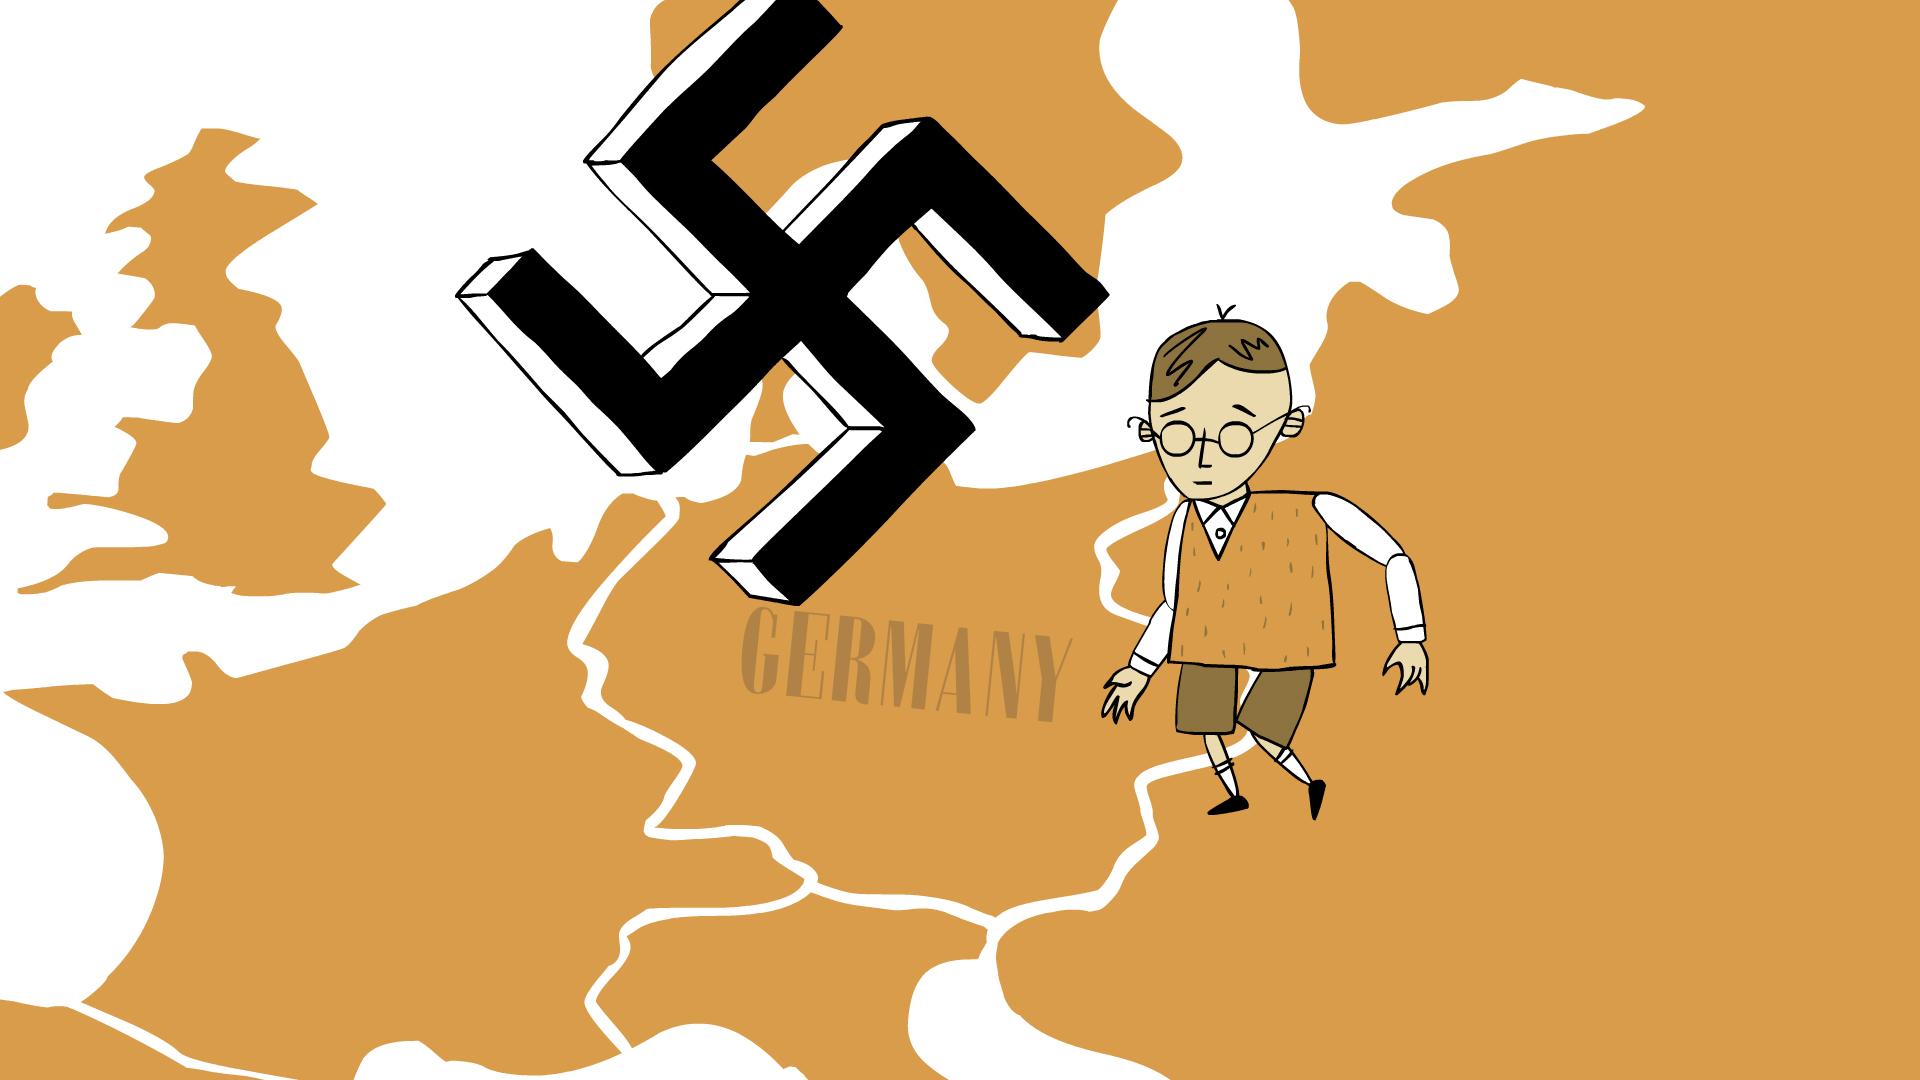 ChildrenofTheHollocaustRedSmall Children Of The Holocaust Heinz 2 Fettle Animation